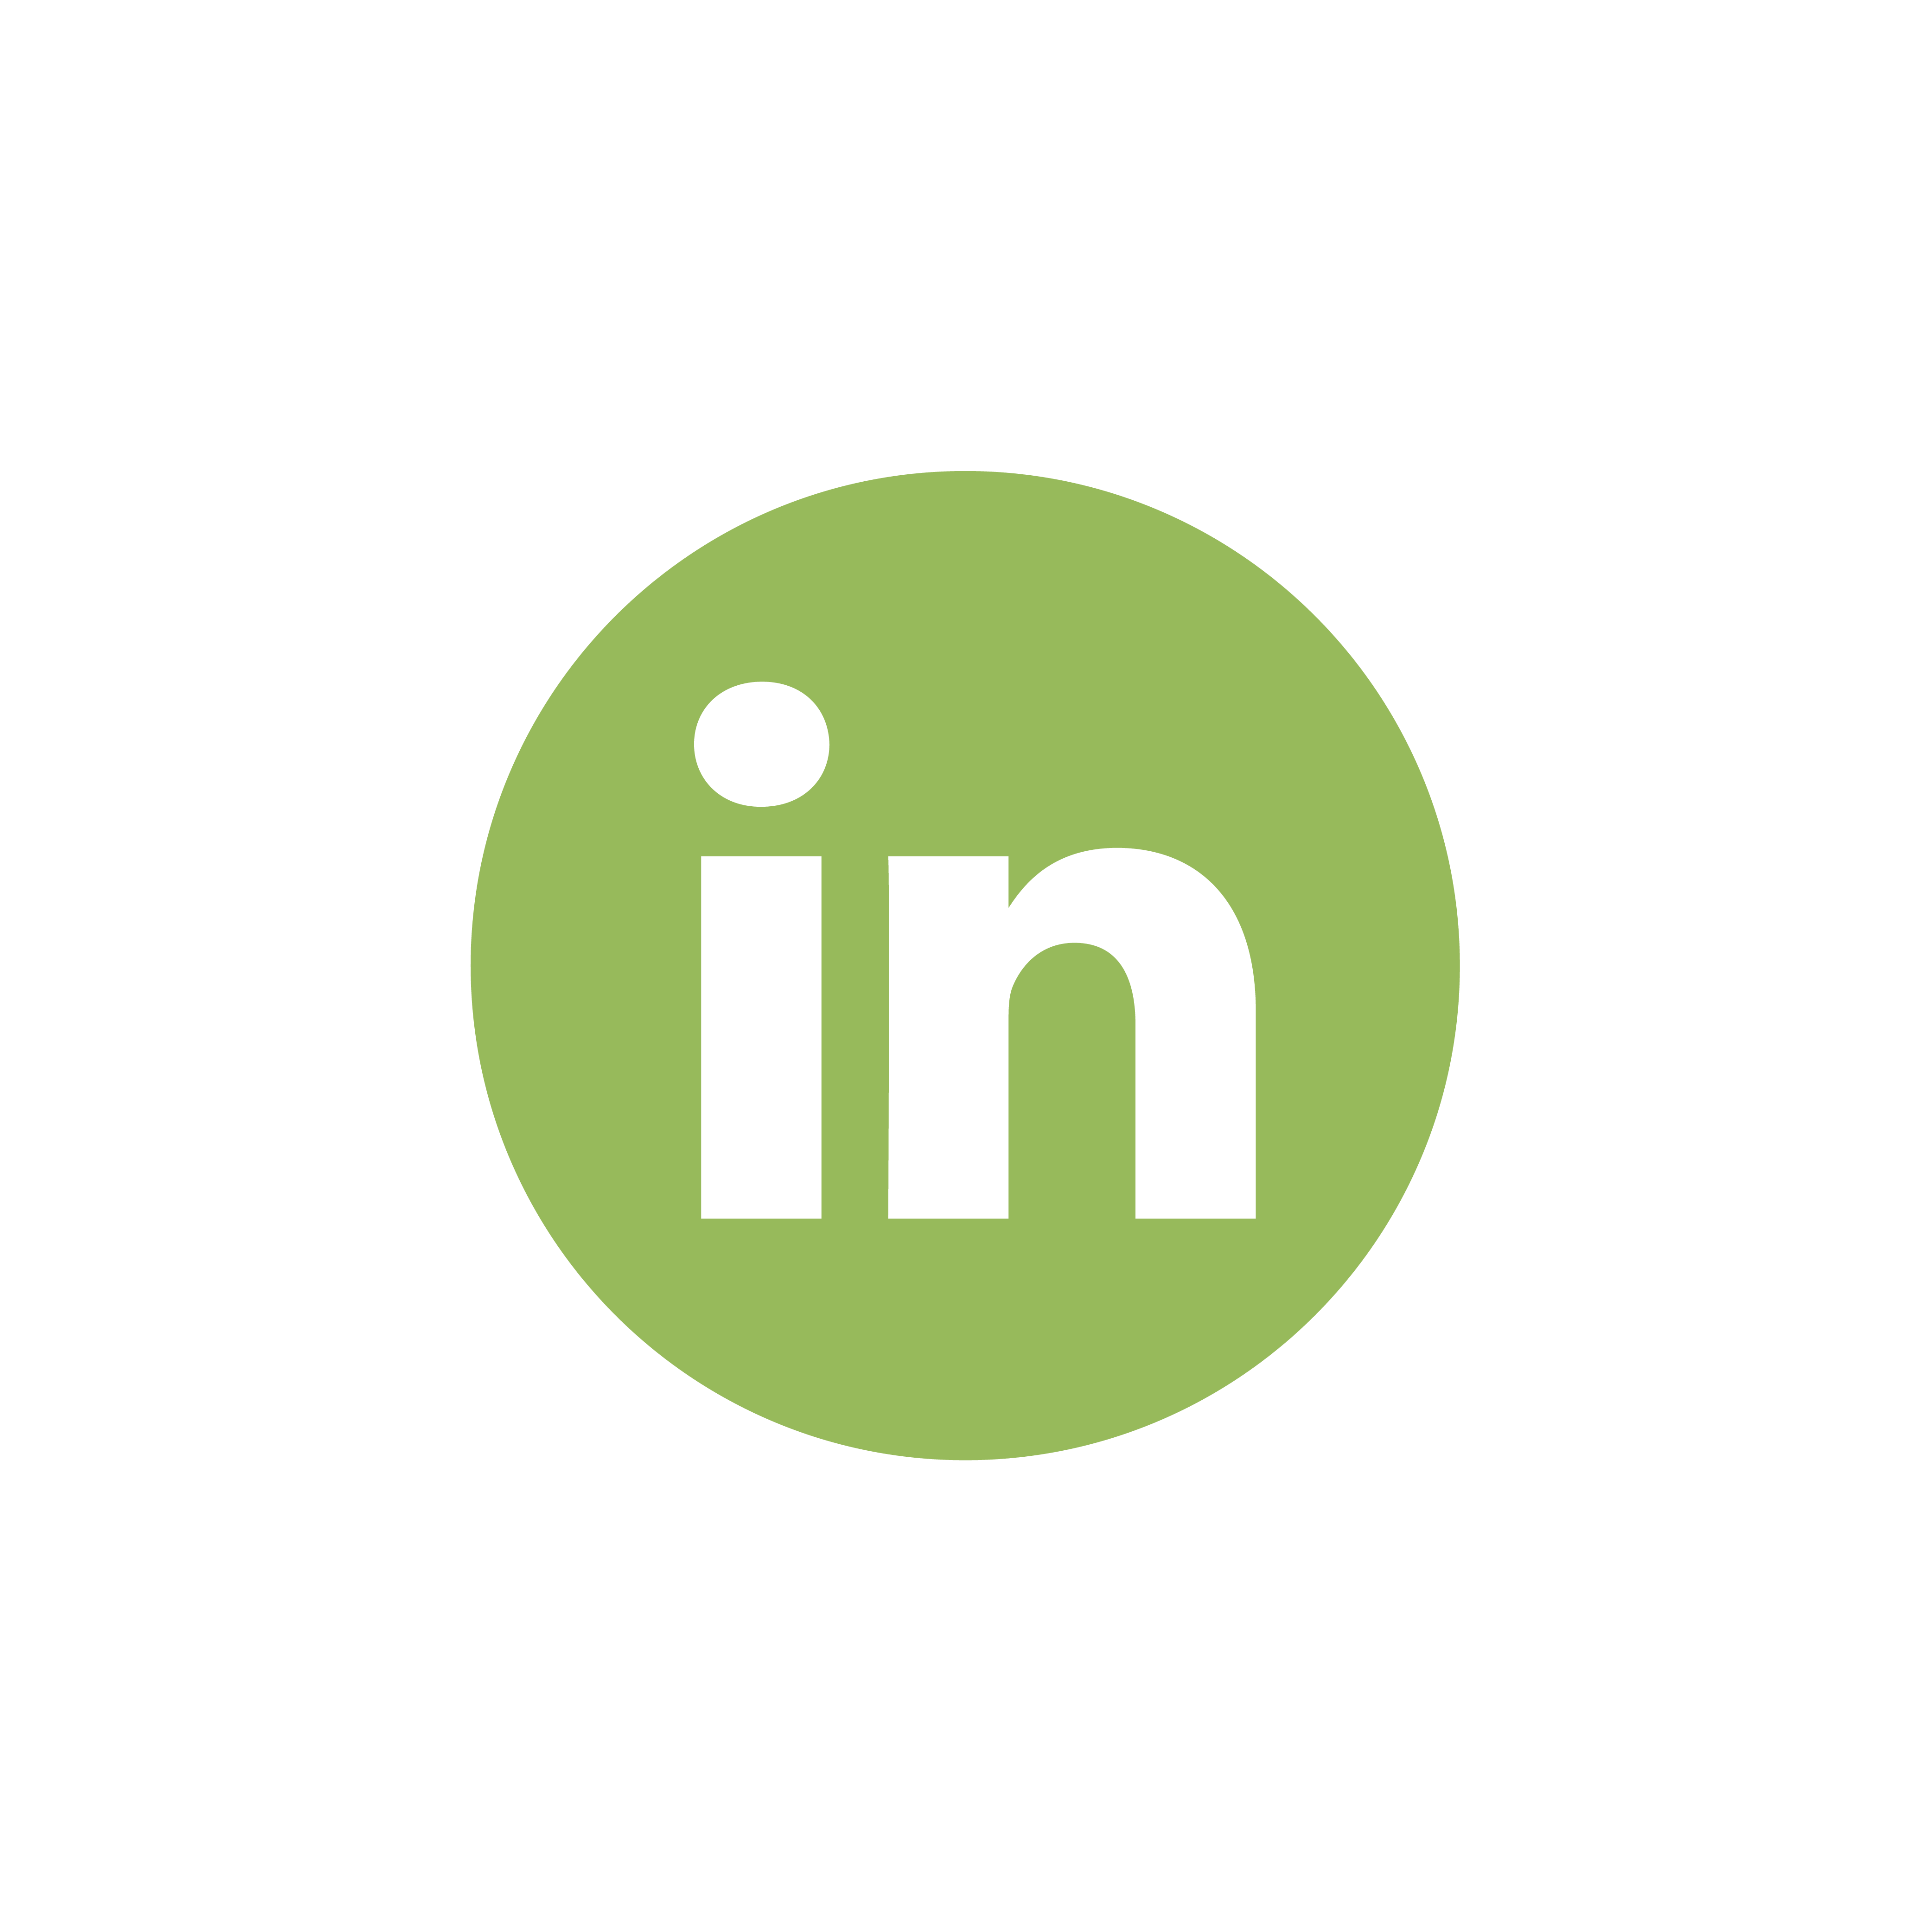 linkedin_Prancheta 1 - Copia